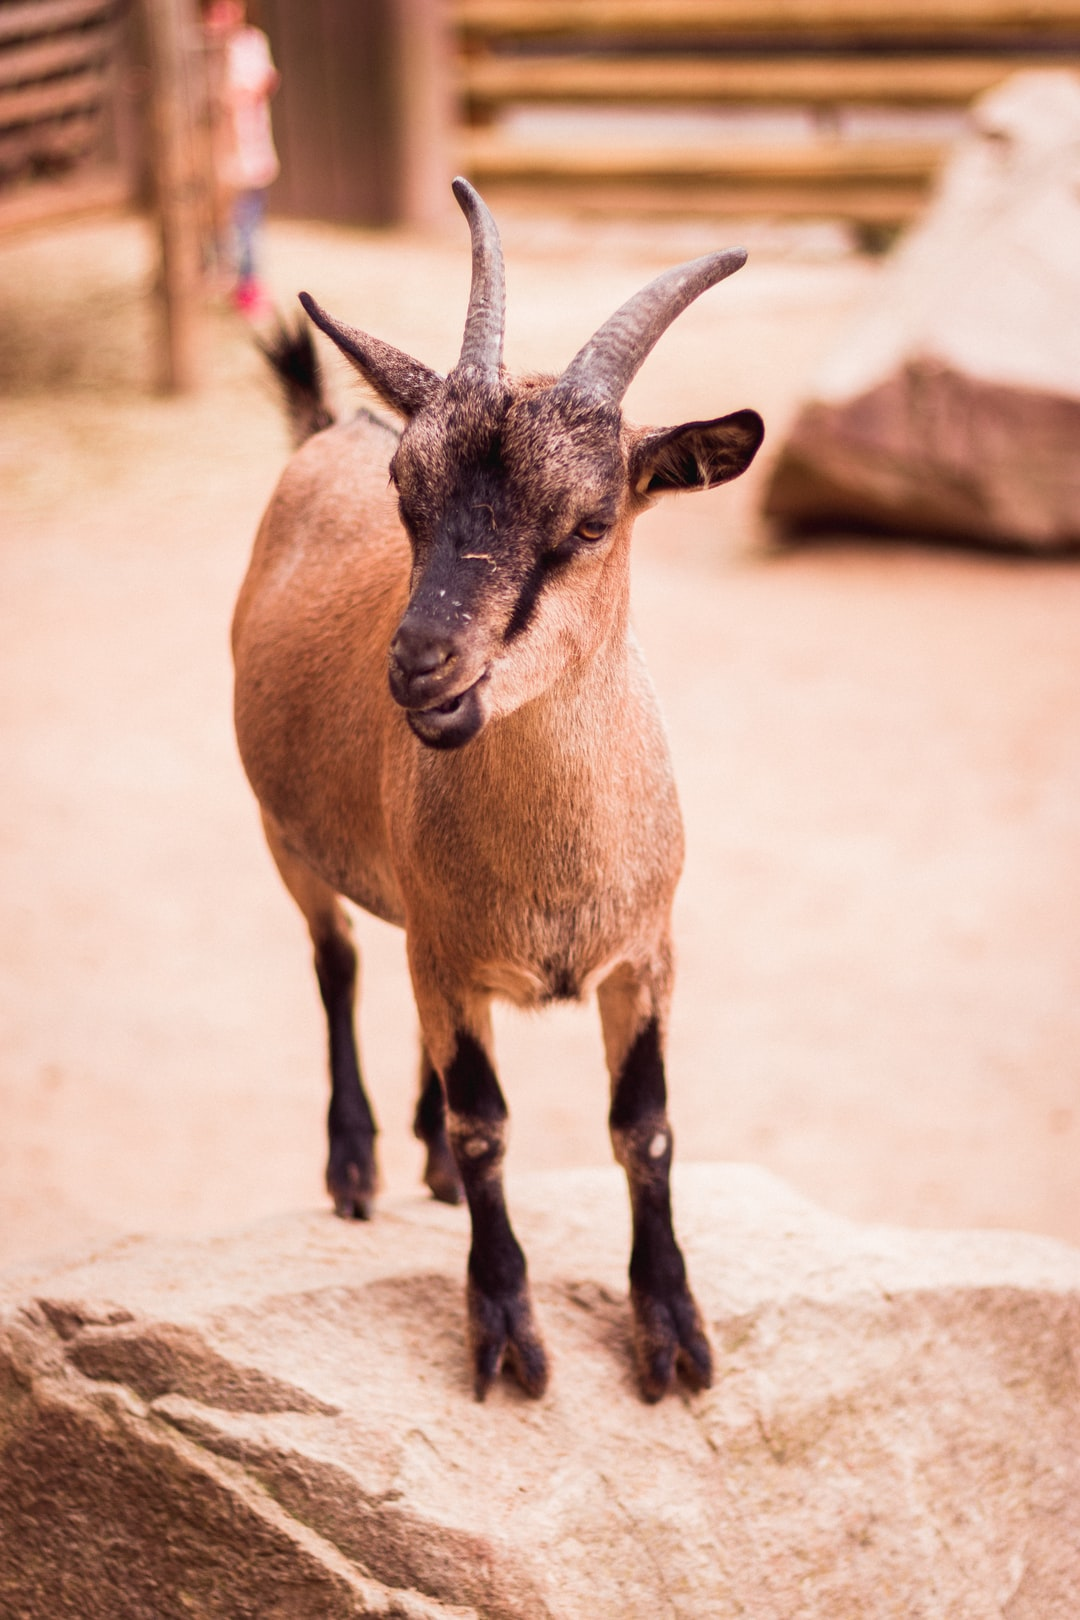 Goat in the Dortmunder Zoo